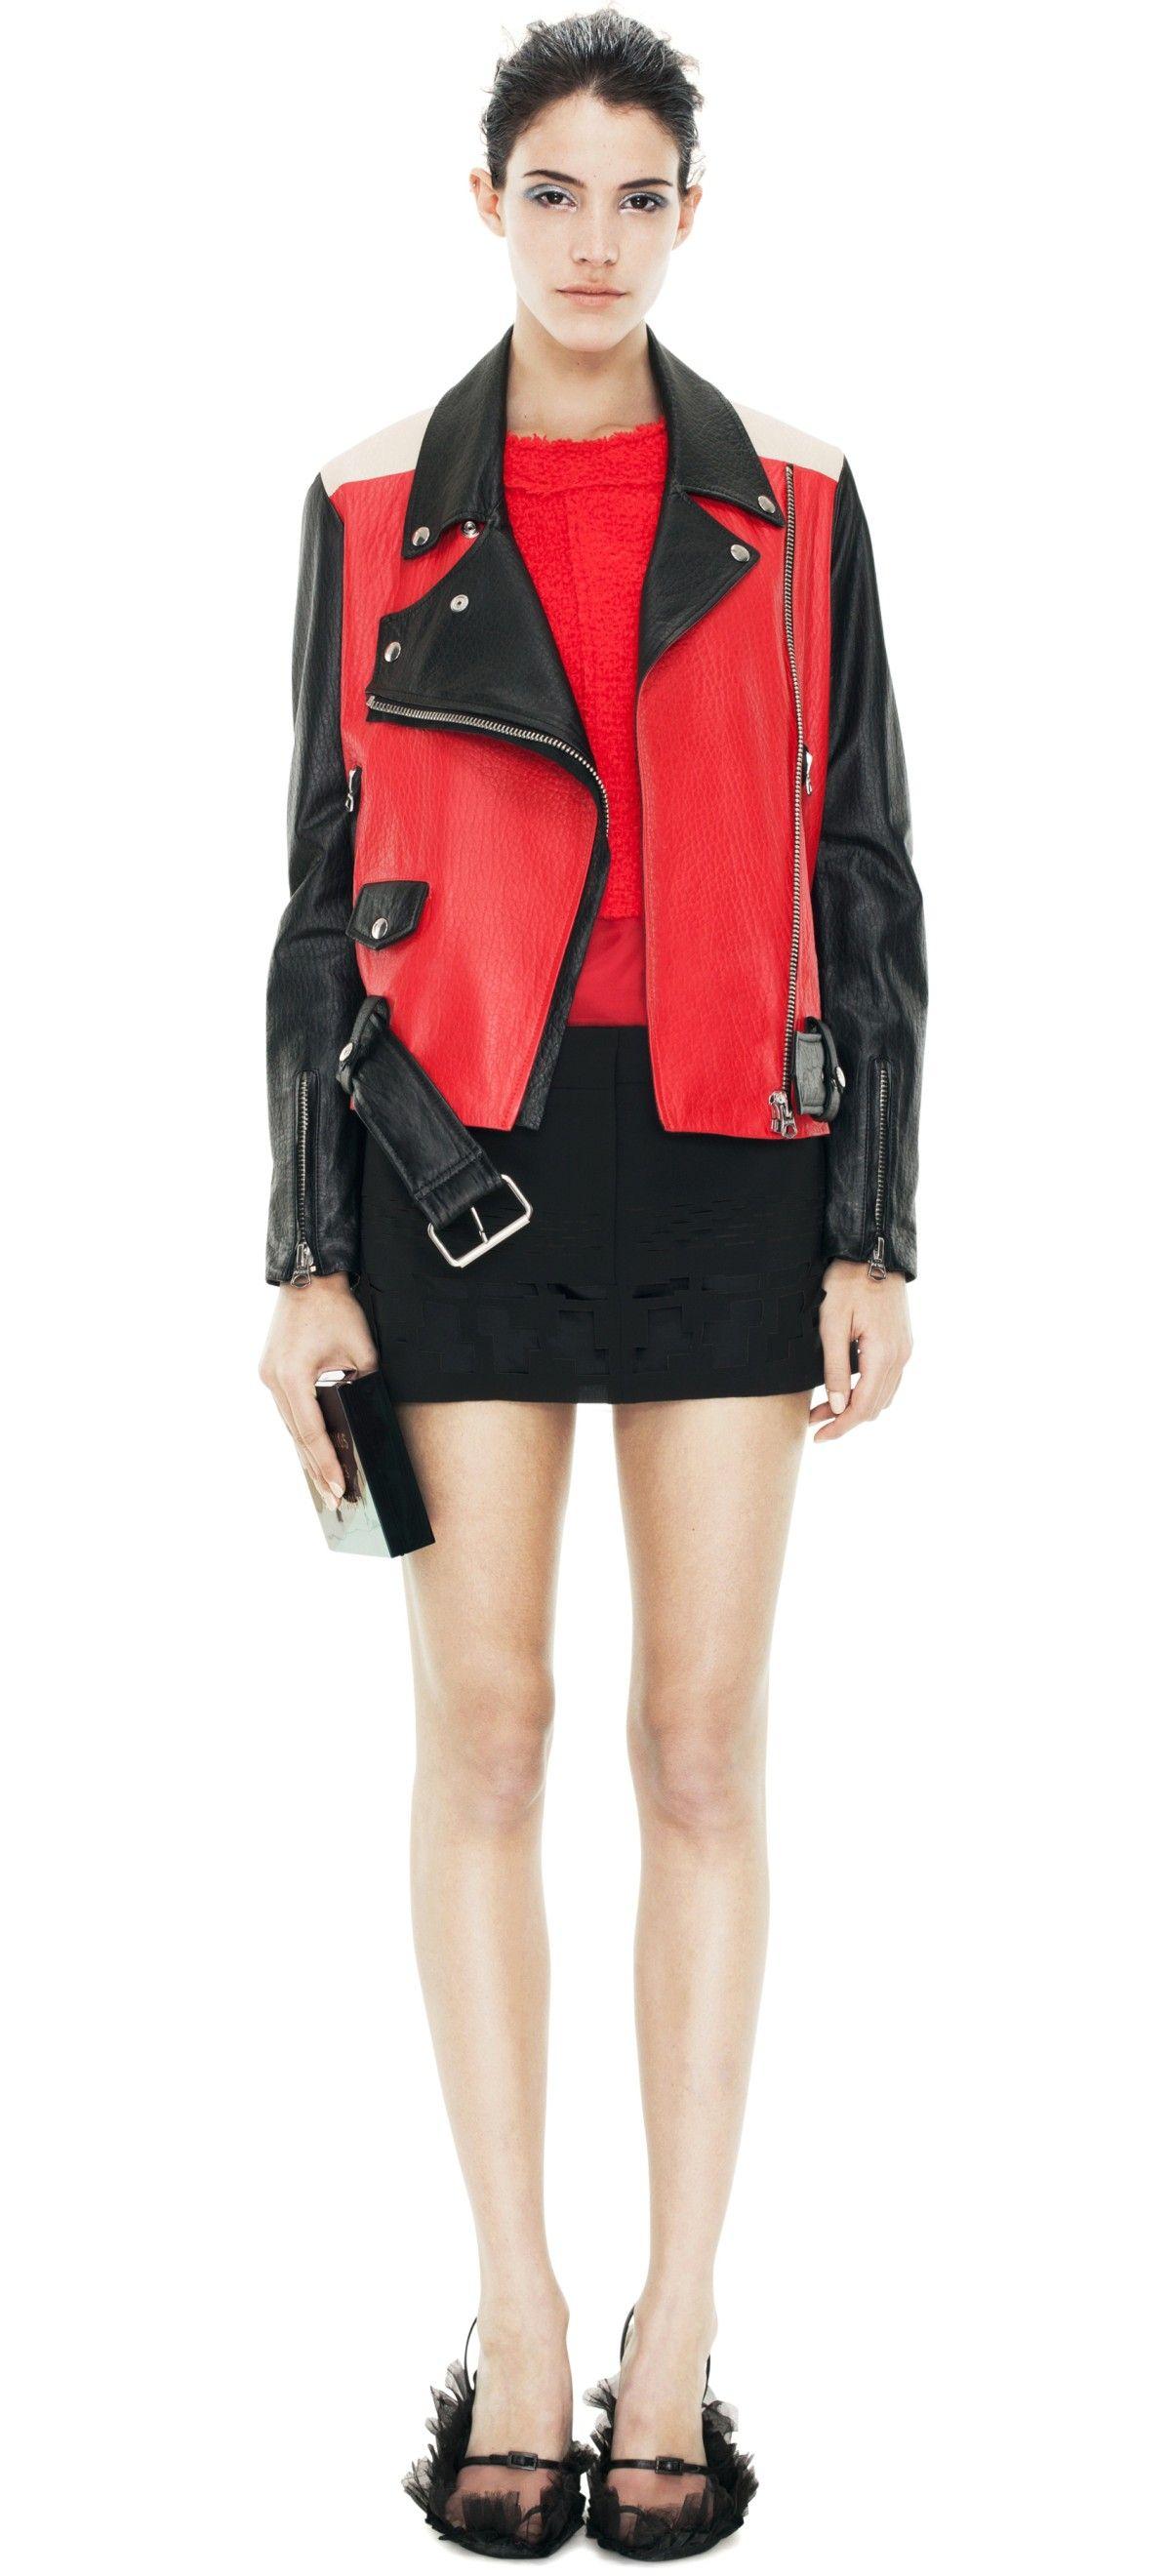 Acne Fall 13 Leather jacket, Jackets, Fashion